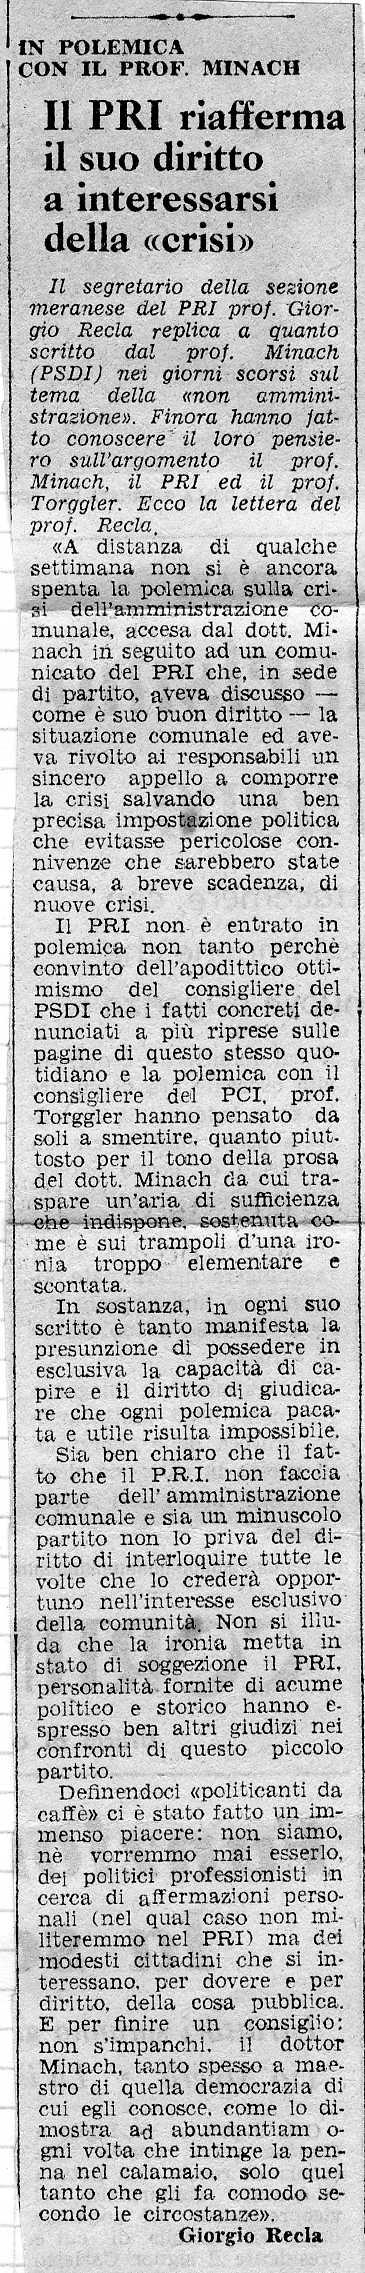 Giorgio Recla004_001.jpg